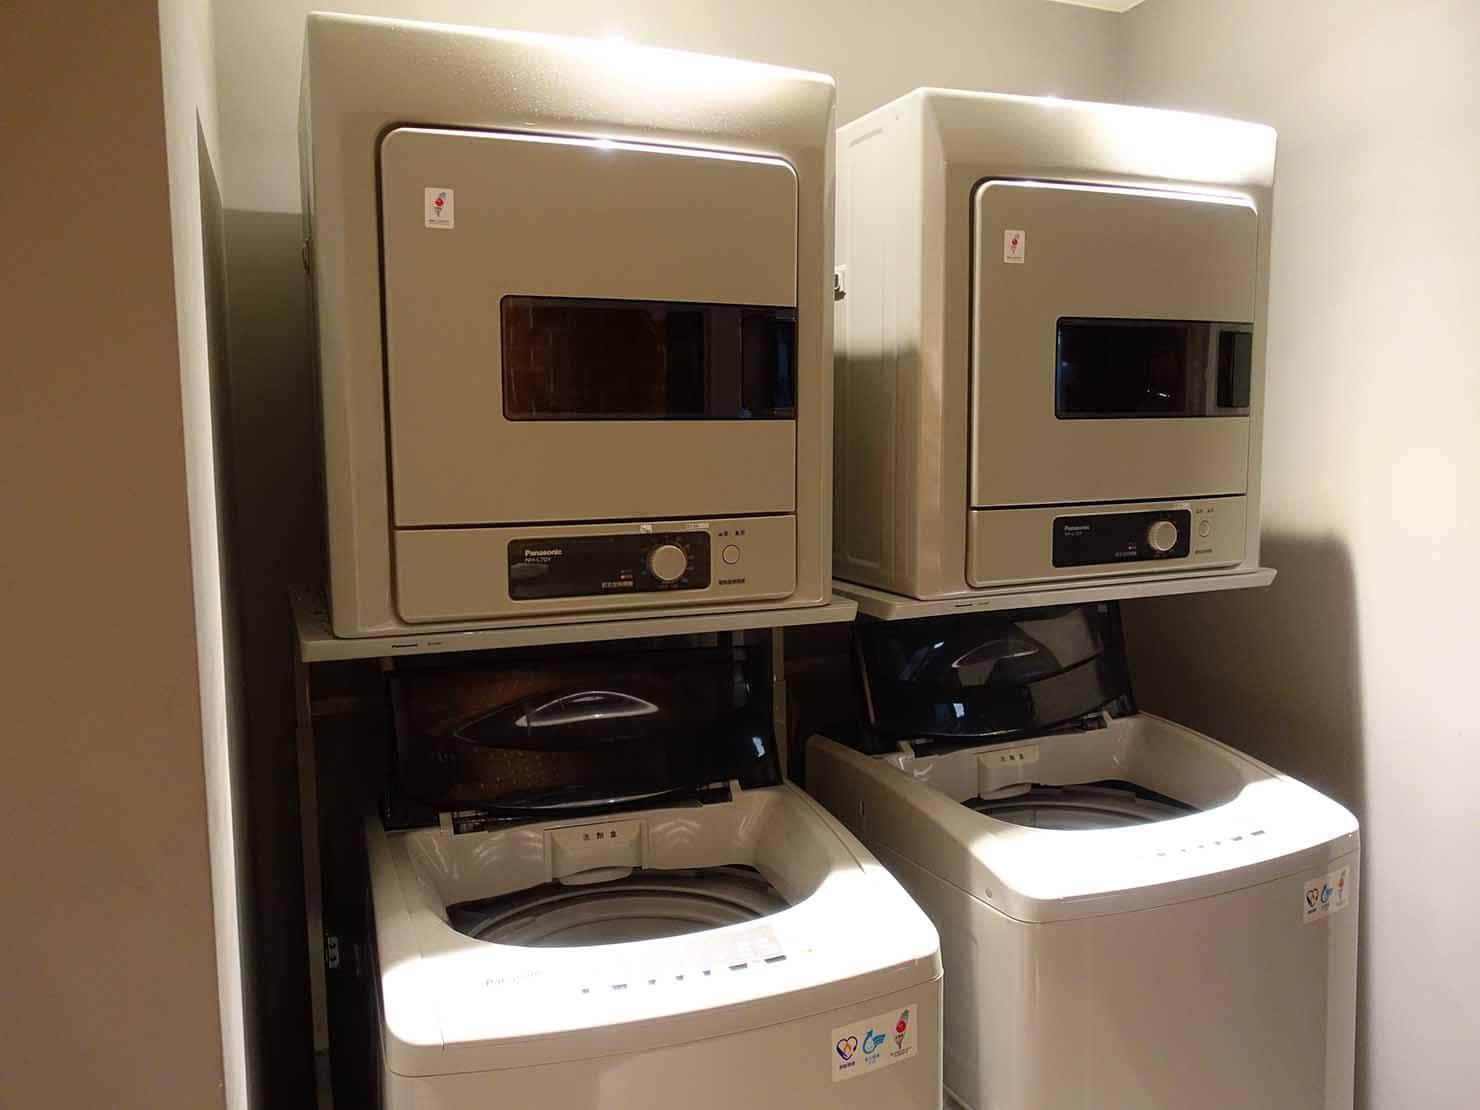 DSC00788-min高雄市内観光におすすめのホテル「GREET INN 喜迎旅店」の豪華雙人房(デラックスダブル)15Fランドリールームの洗濯機